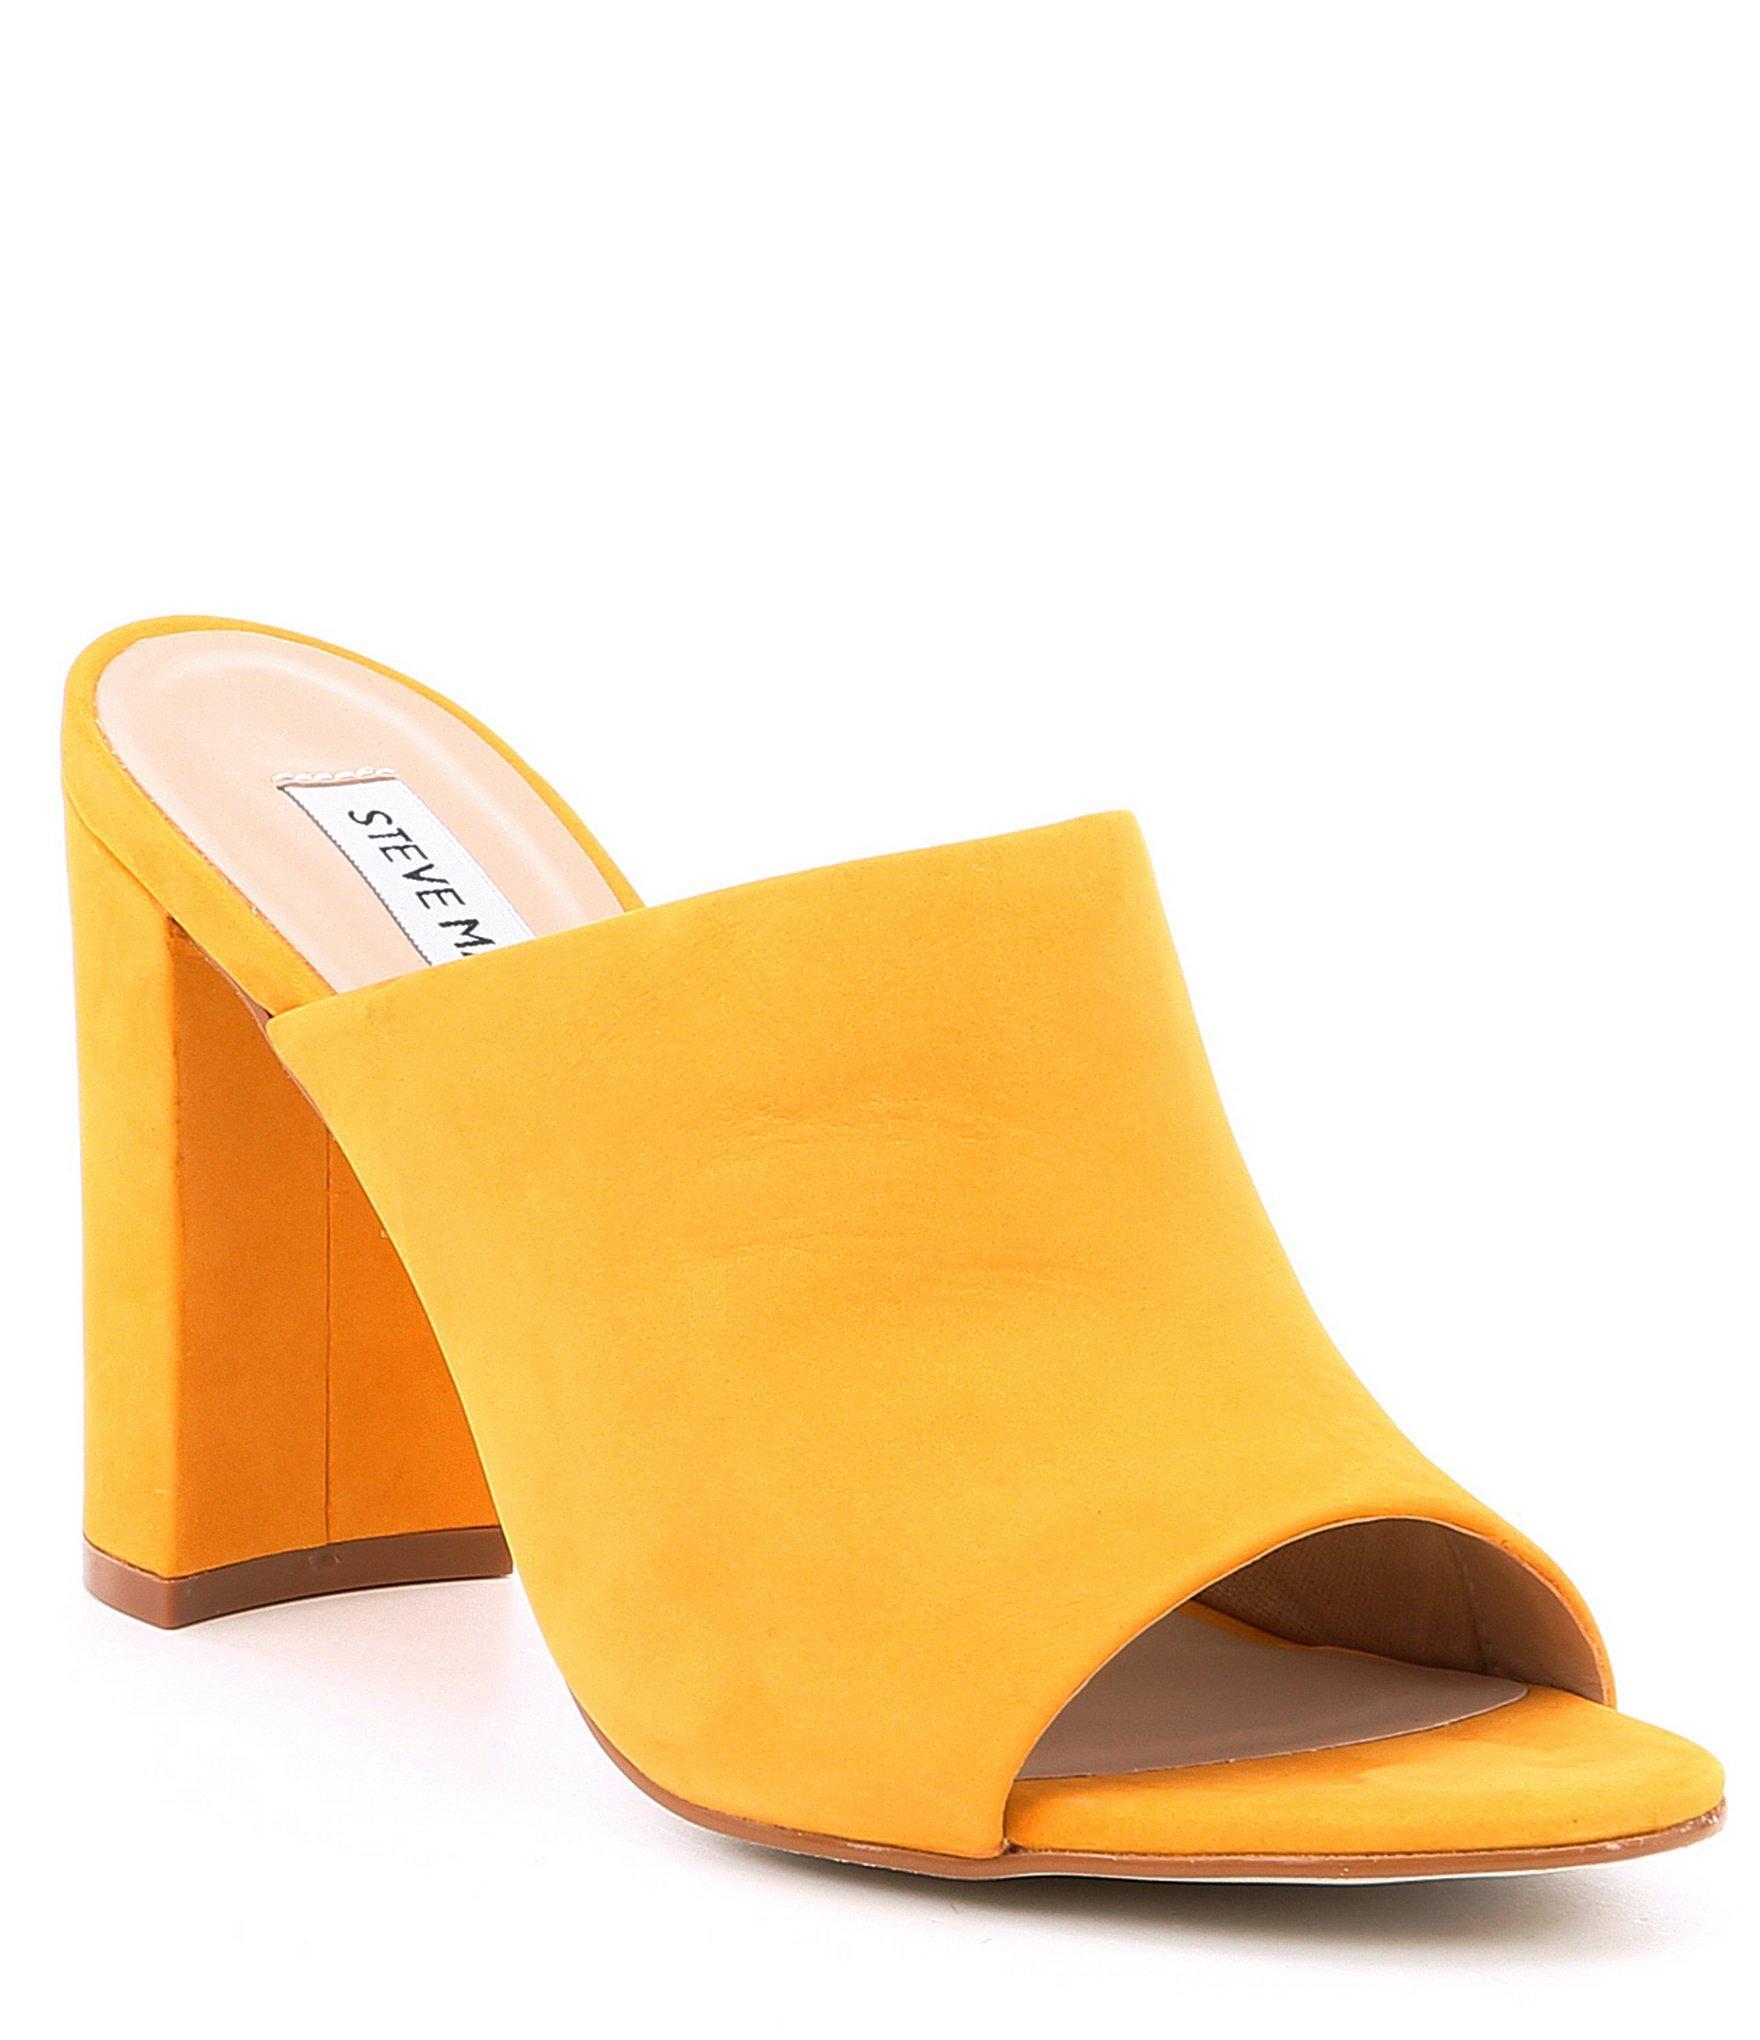 c49df9edc33 Lyst - Steve Madden Esmeralda Nubuck Block Heel Mules in Yellow